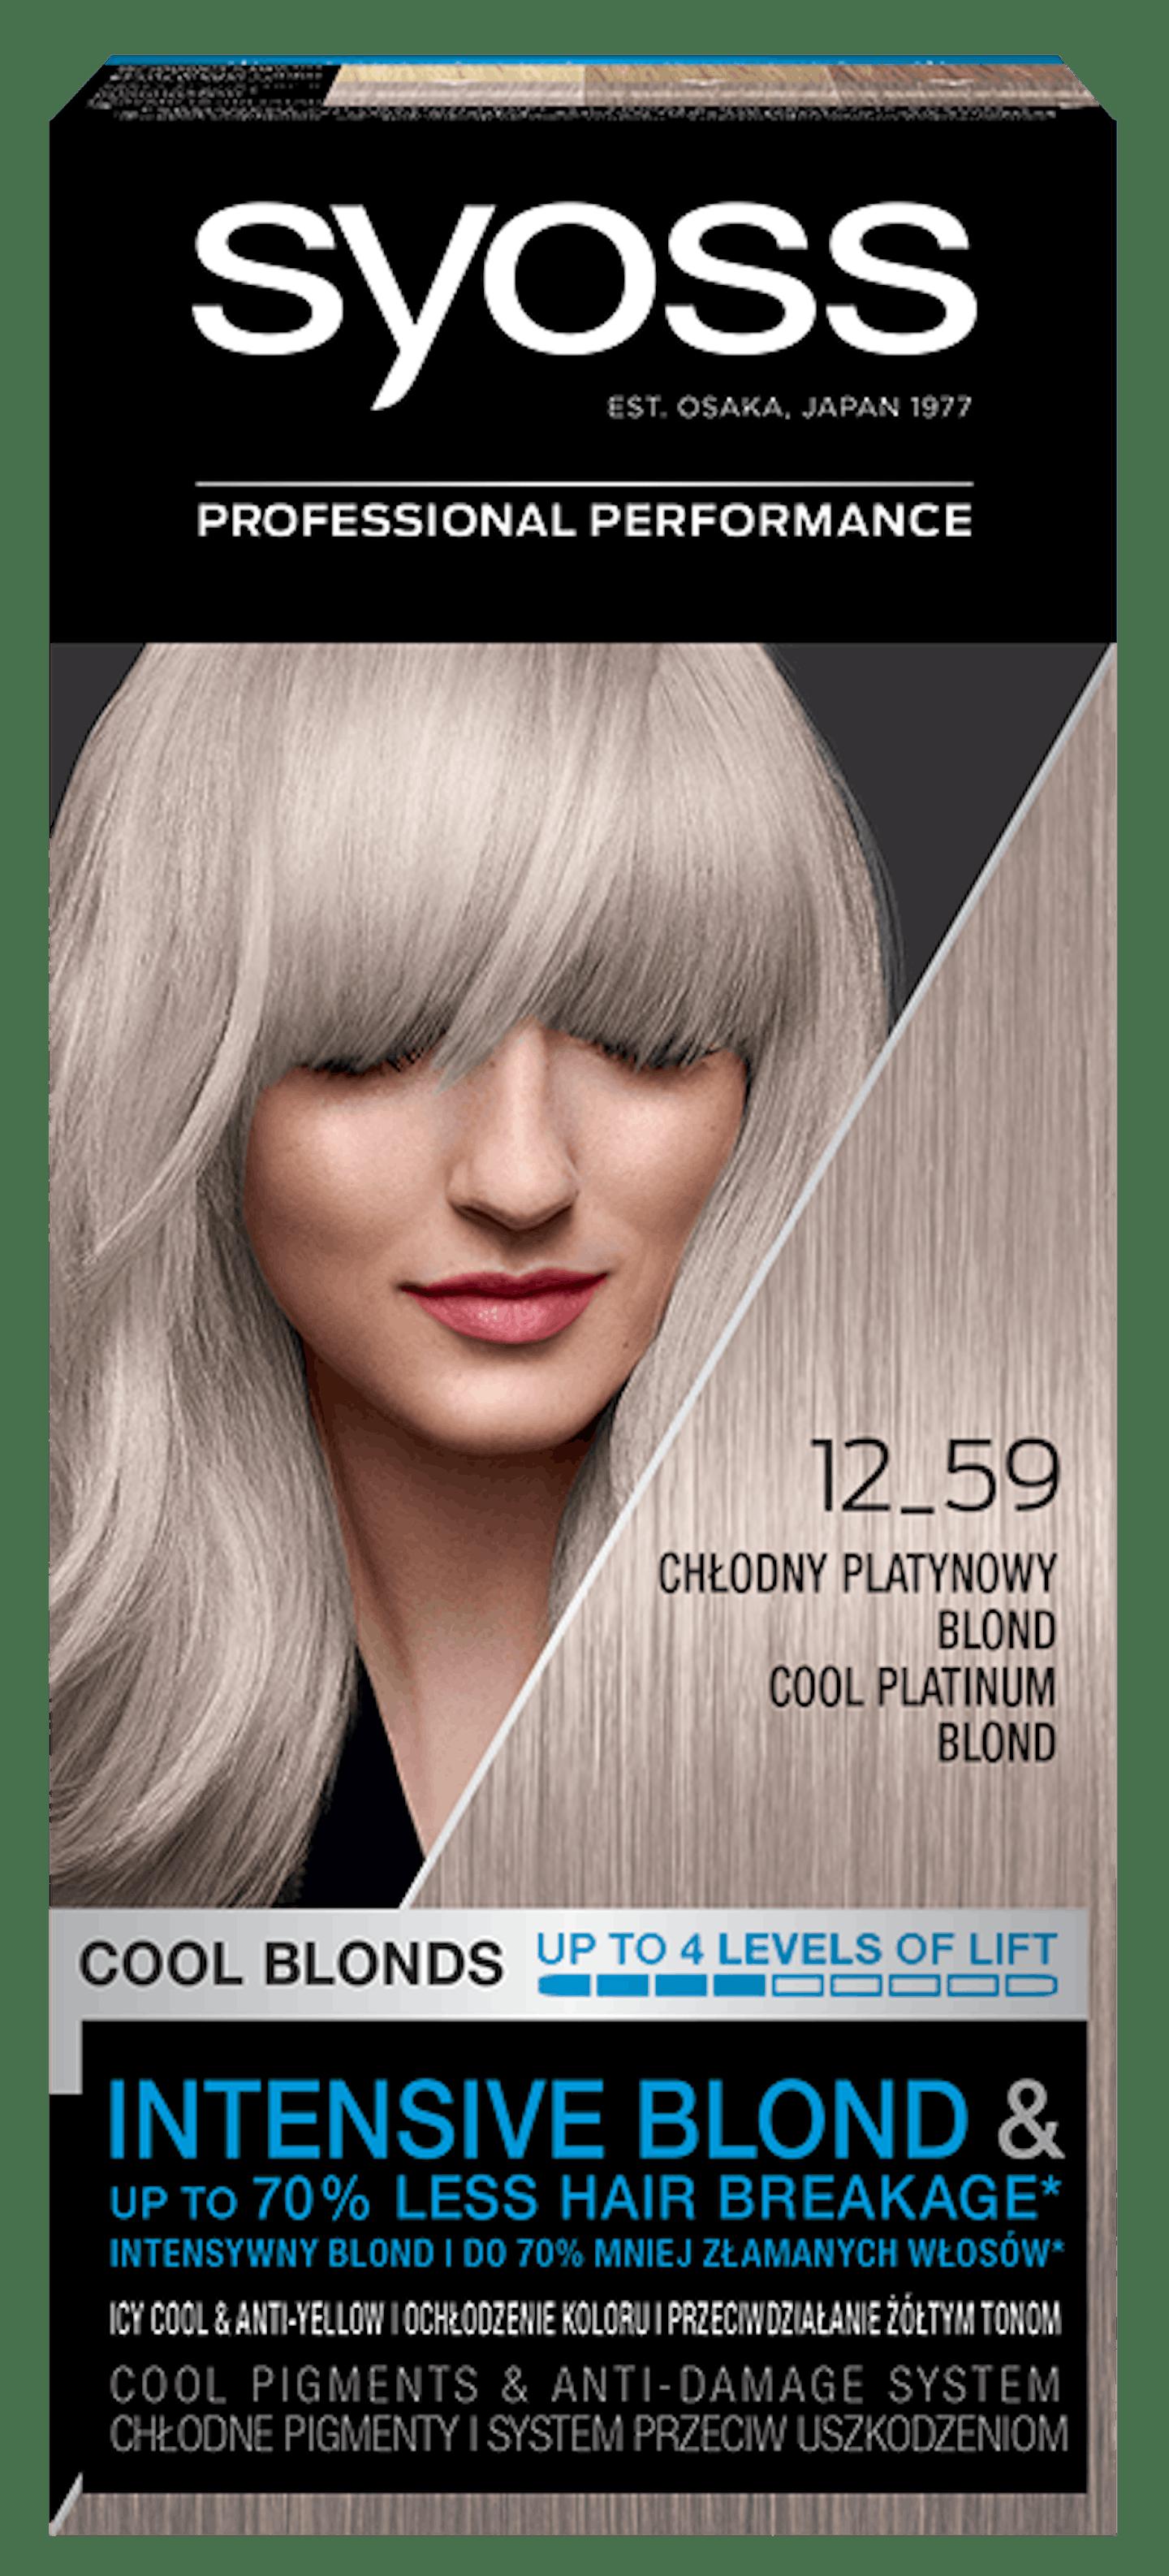 Trajna barva za lase Syoss Hladna platinasto blond 12-59